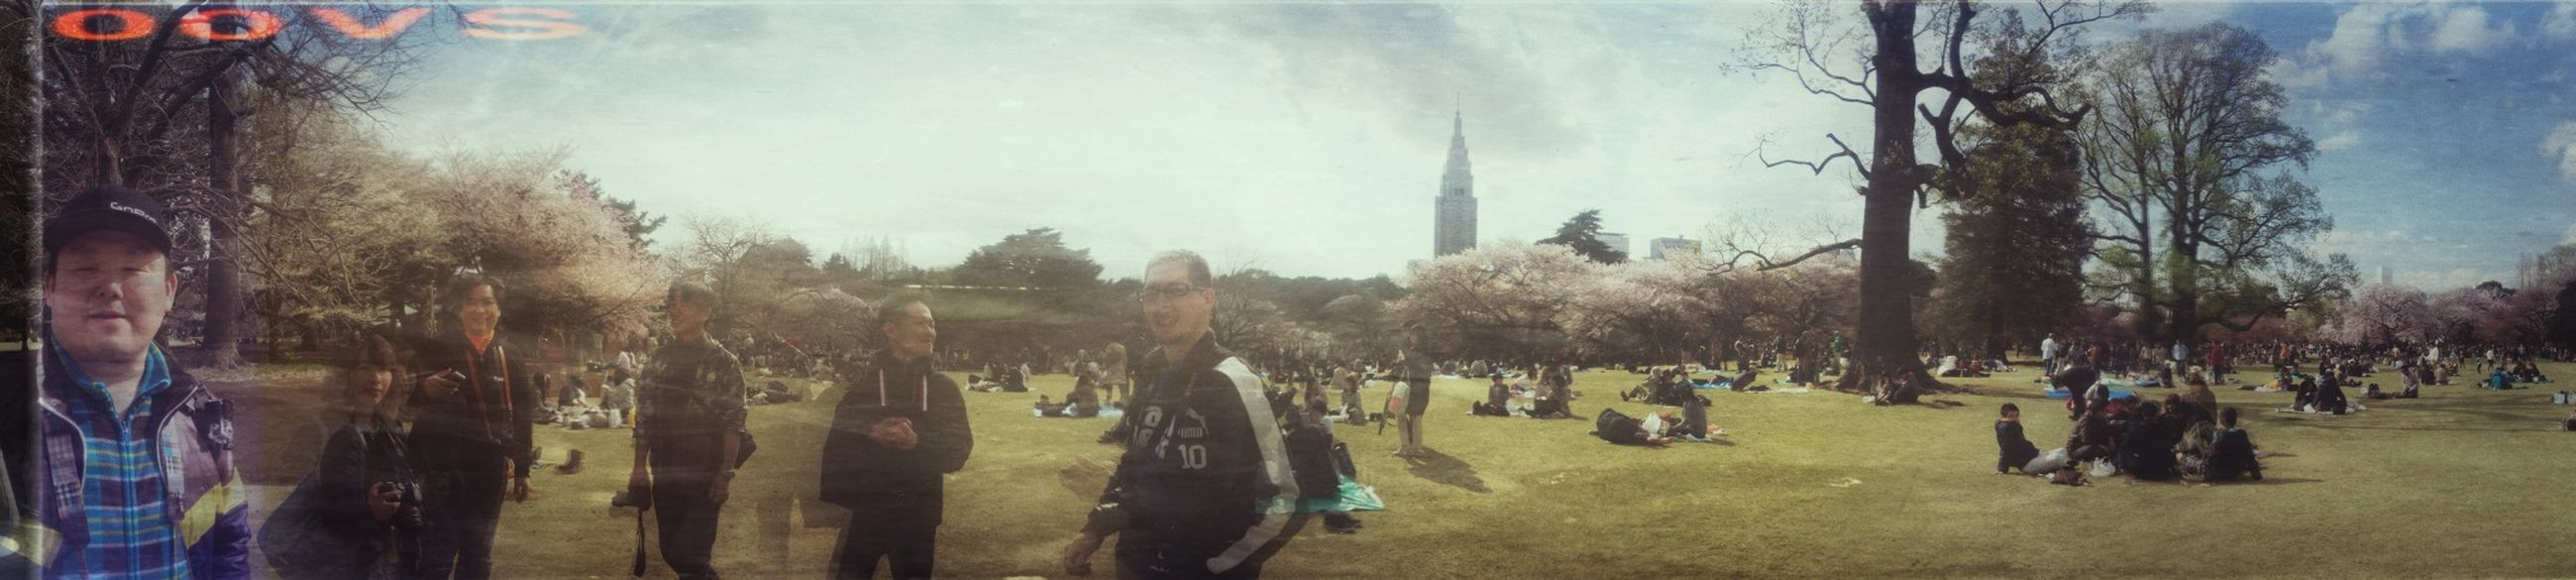 EyeEm Tokyo Meetup 3 Panorama Snapseed Relaxing 新宿御苑フォトウォーク